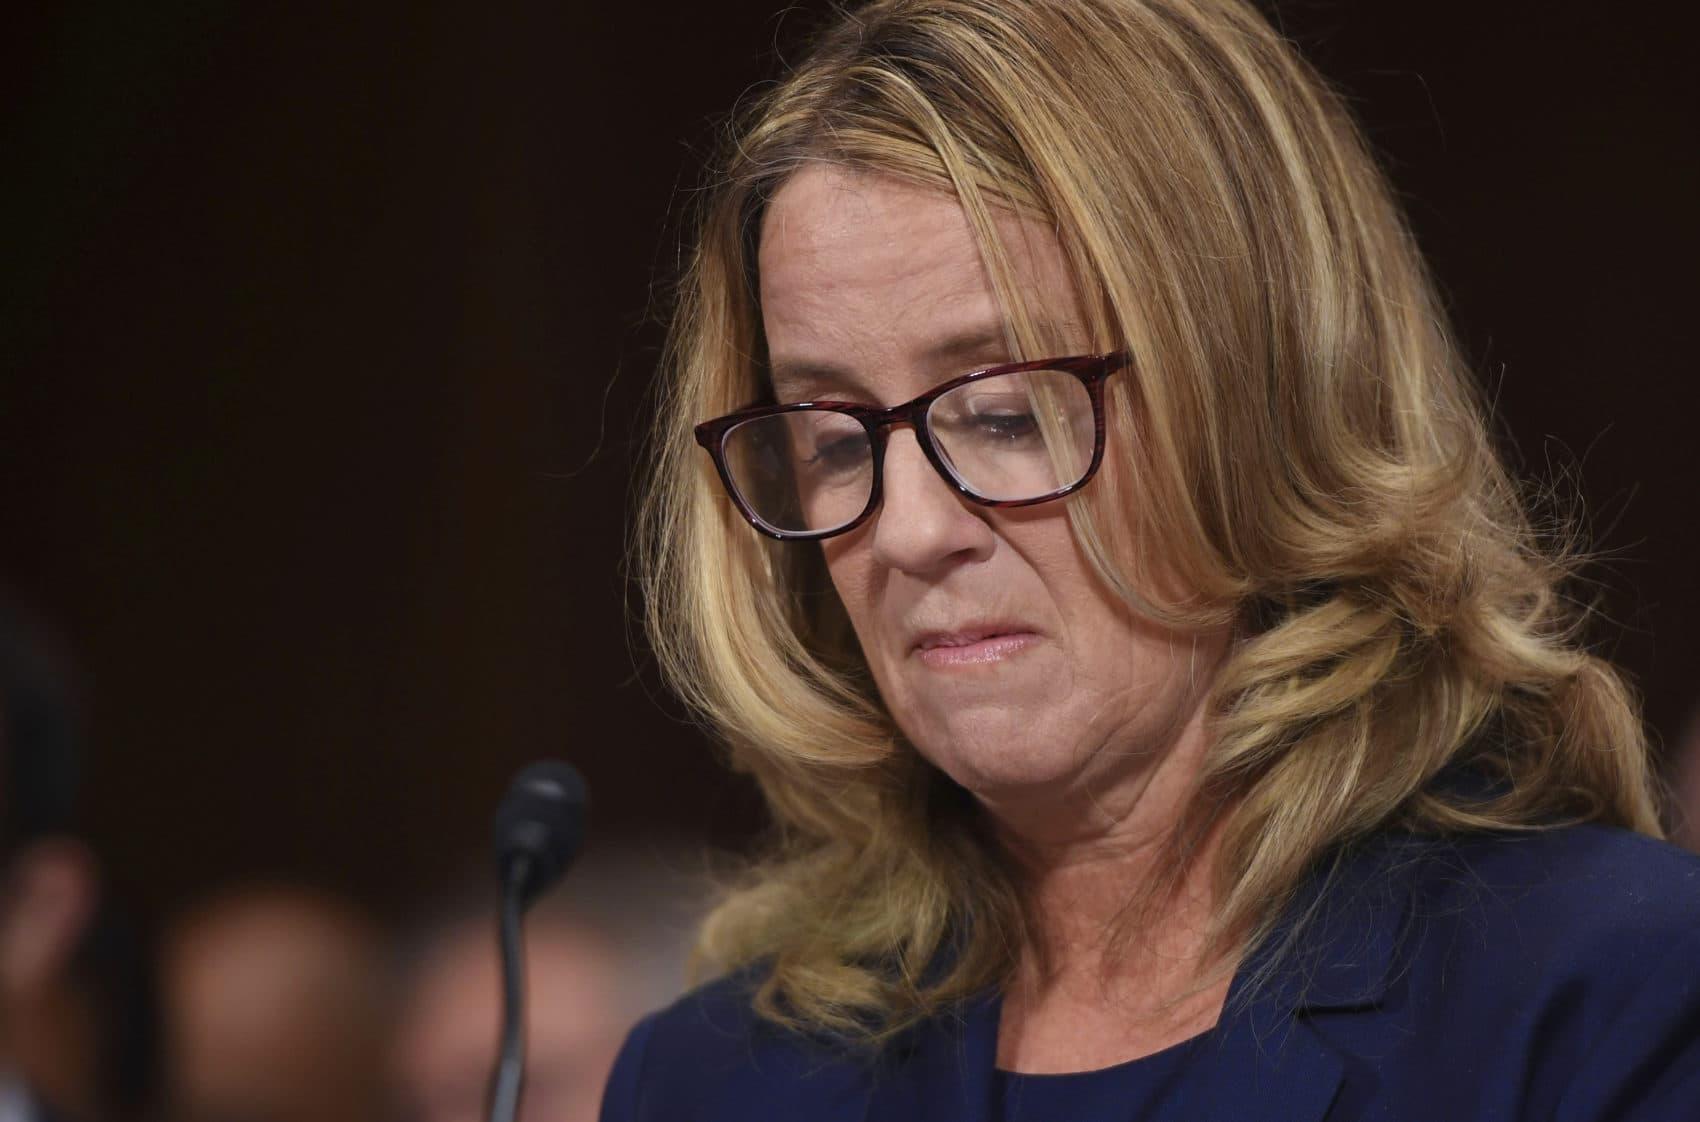 Christine Blasey Ford testifies to the Senate Judiciary Committee on Capitol Hill in Washington, Thursday, Sept. 27, 2018. (Saul Loeb/Pool Photo/AP)